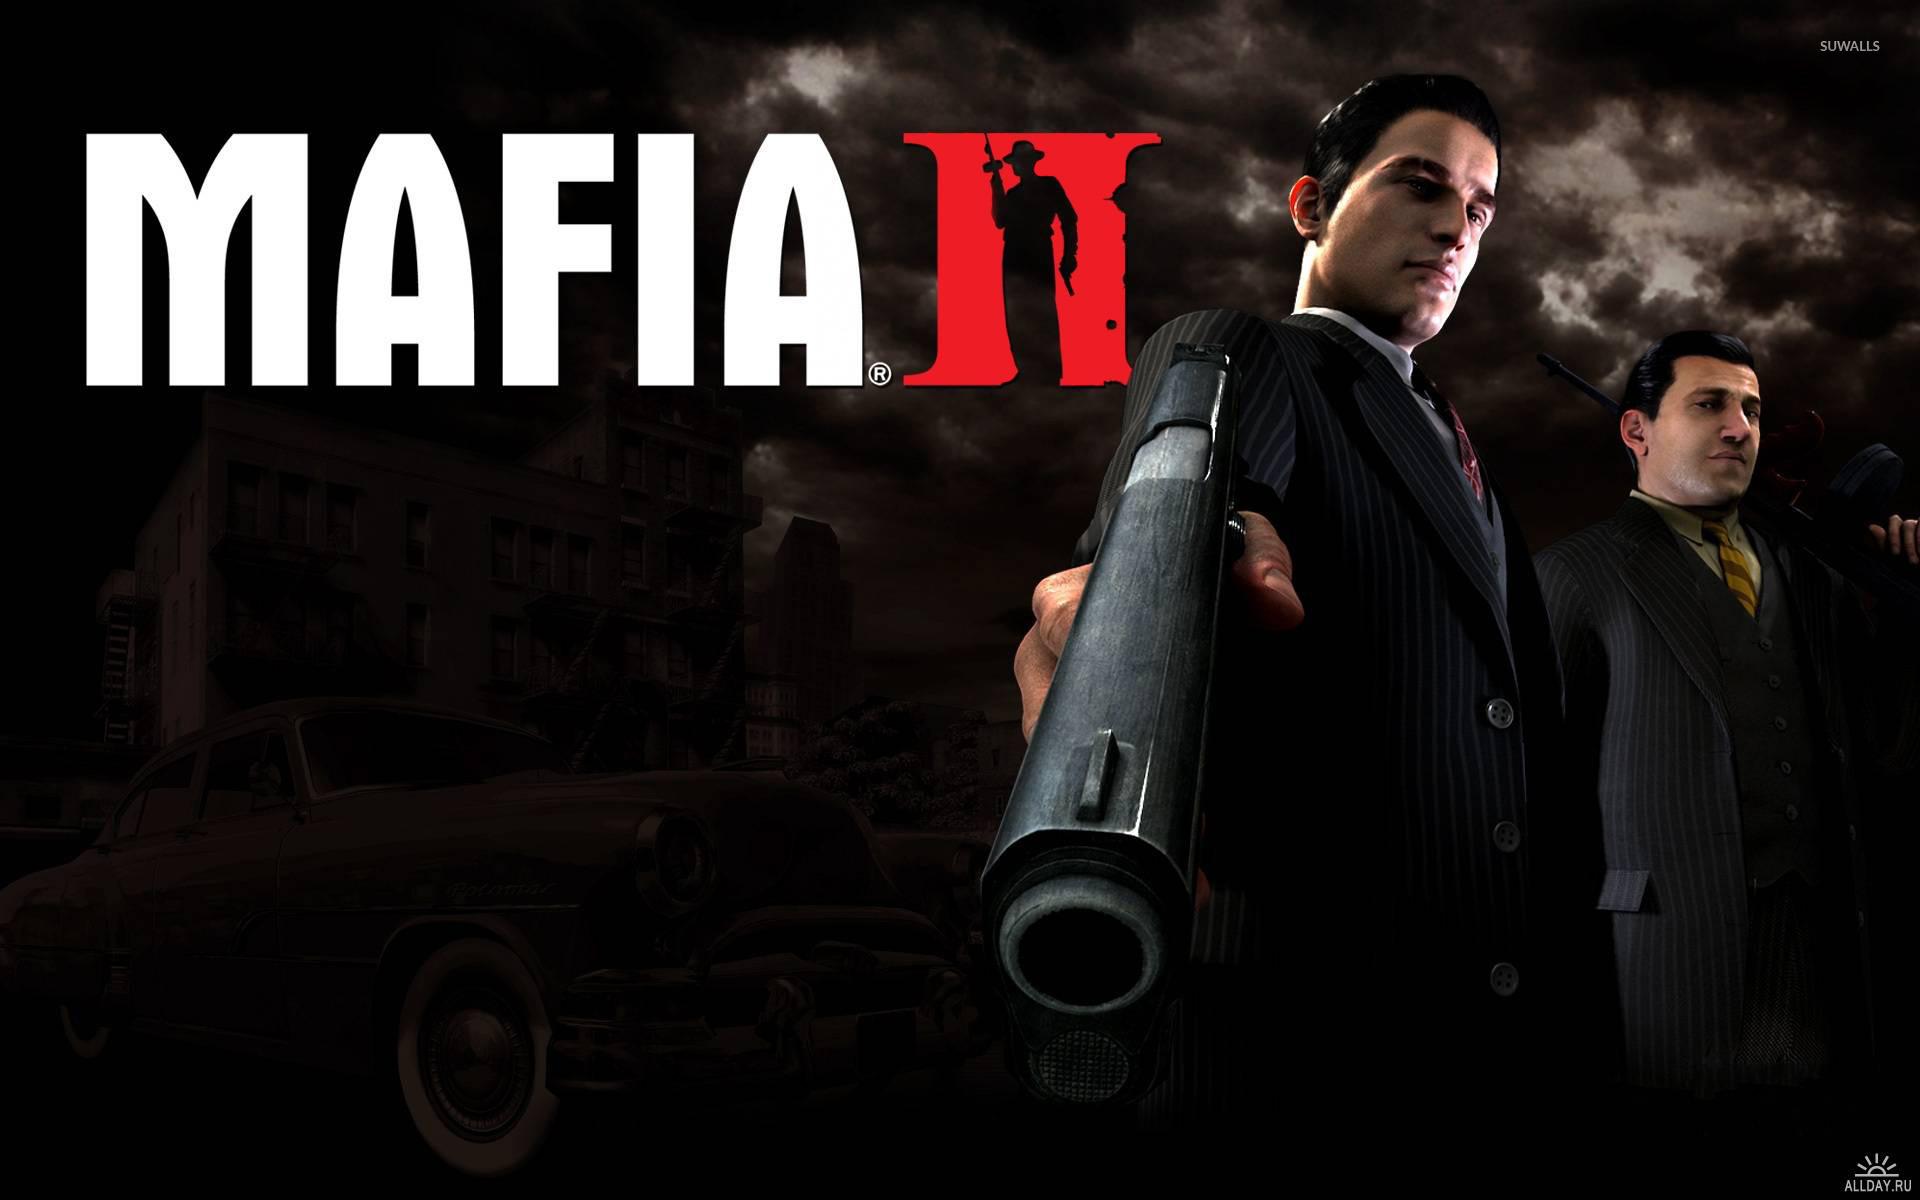 Mafia II [4] wallpaper - Game wallpapers - #9808